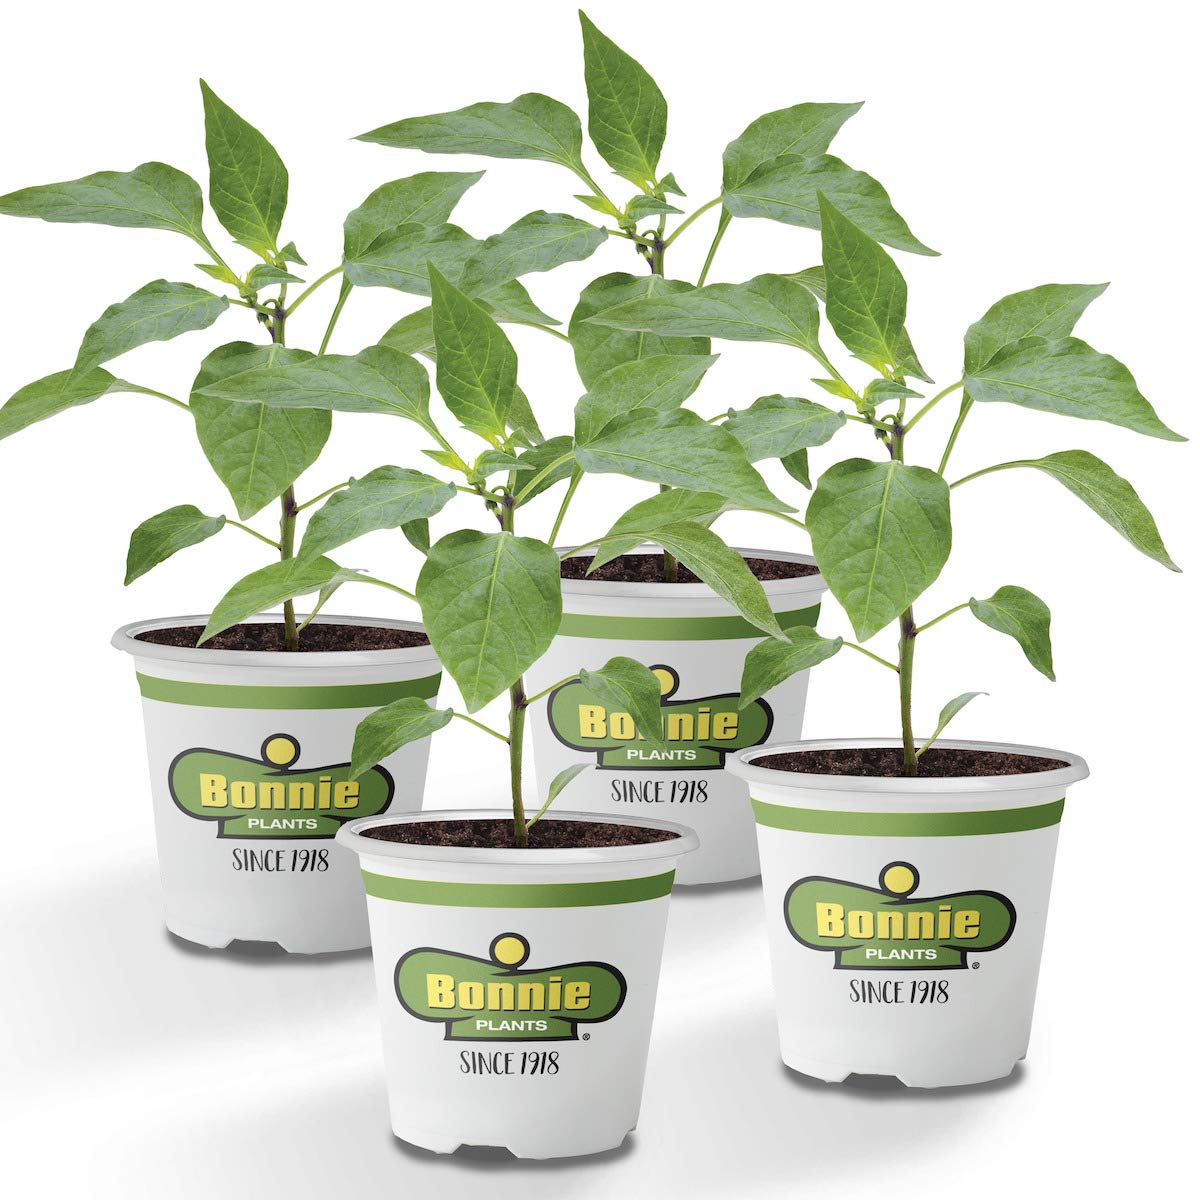 Bonnie Plants Bonnie's Green Bell Pepper Live Vegetable Plants - 4 Pack | Non-GMO | 2 - 3 Ft Plants | 4.5 x 4 Inch Pepper Size